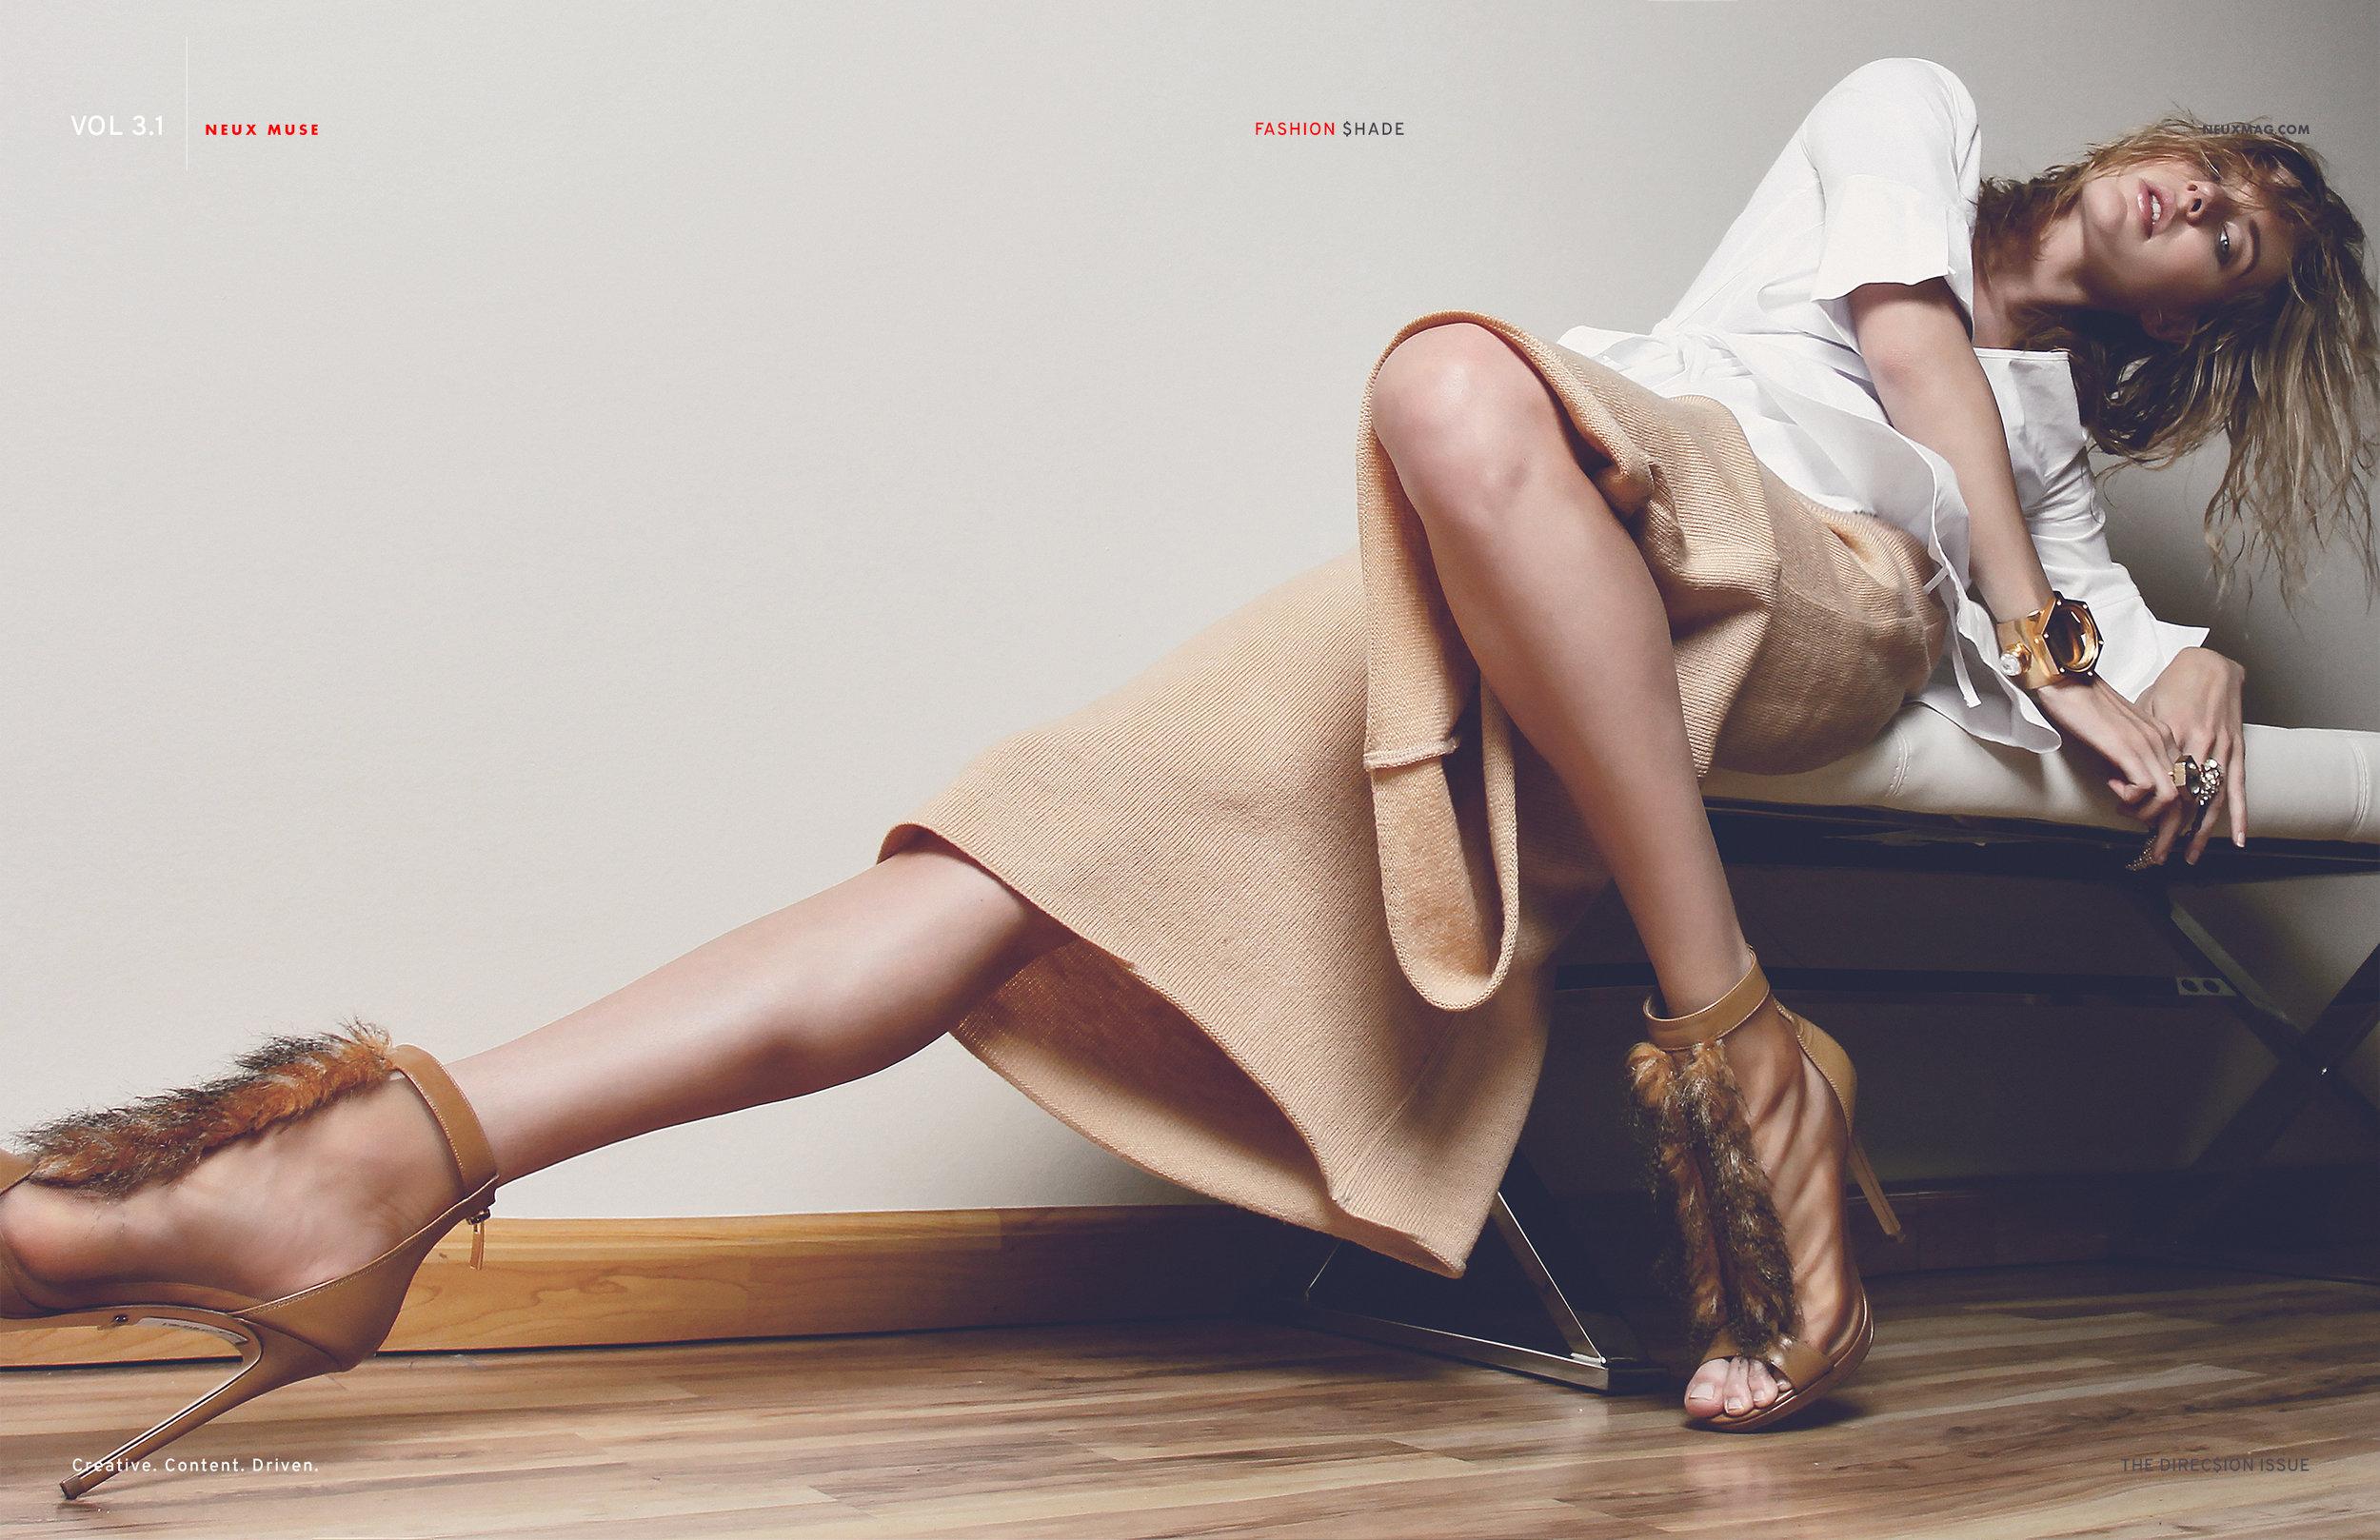 Fashion_Neux_Shade_layout_112017_hr_layout_09.jpg